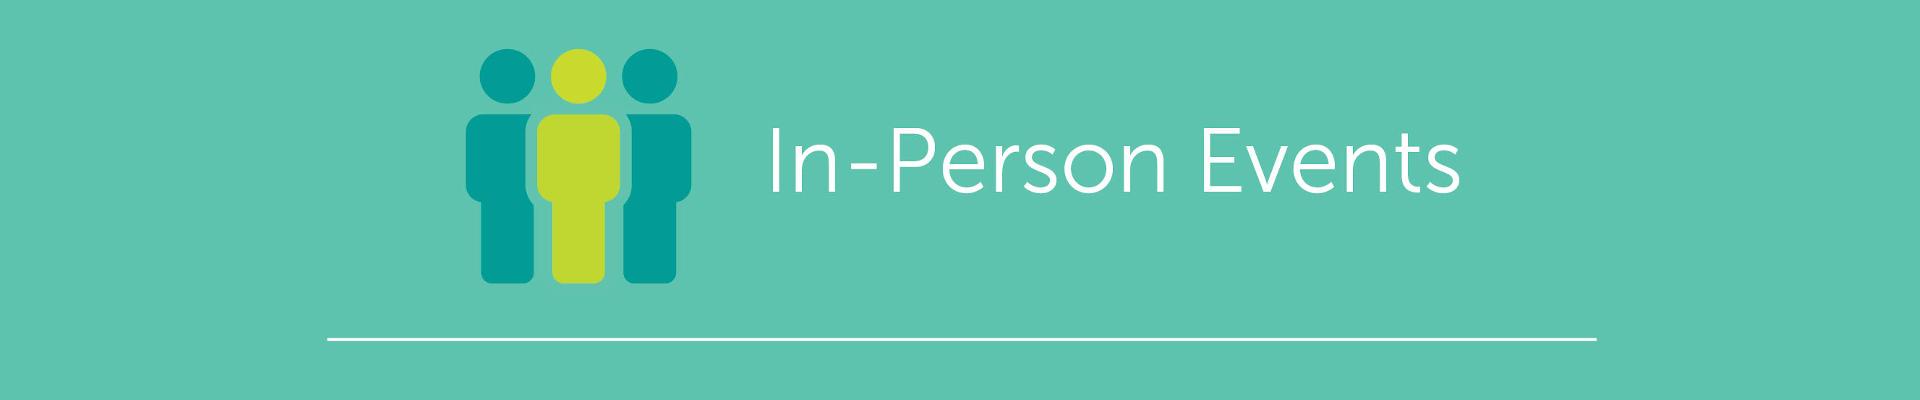 In-Person